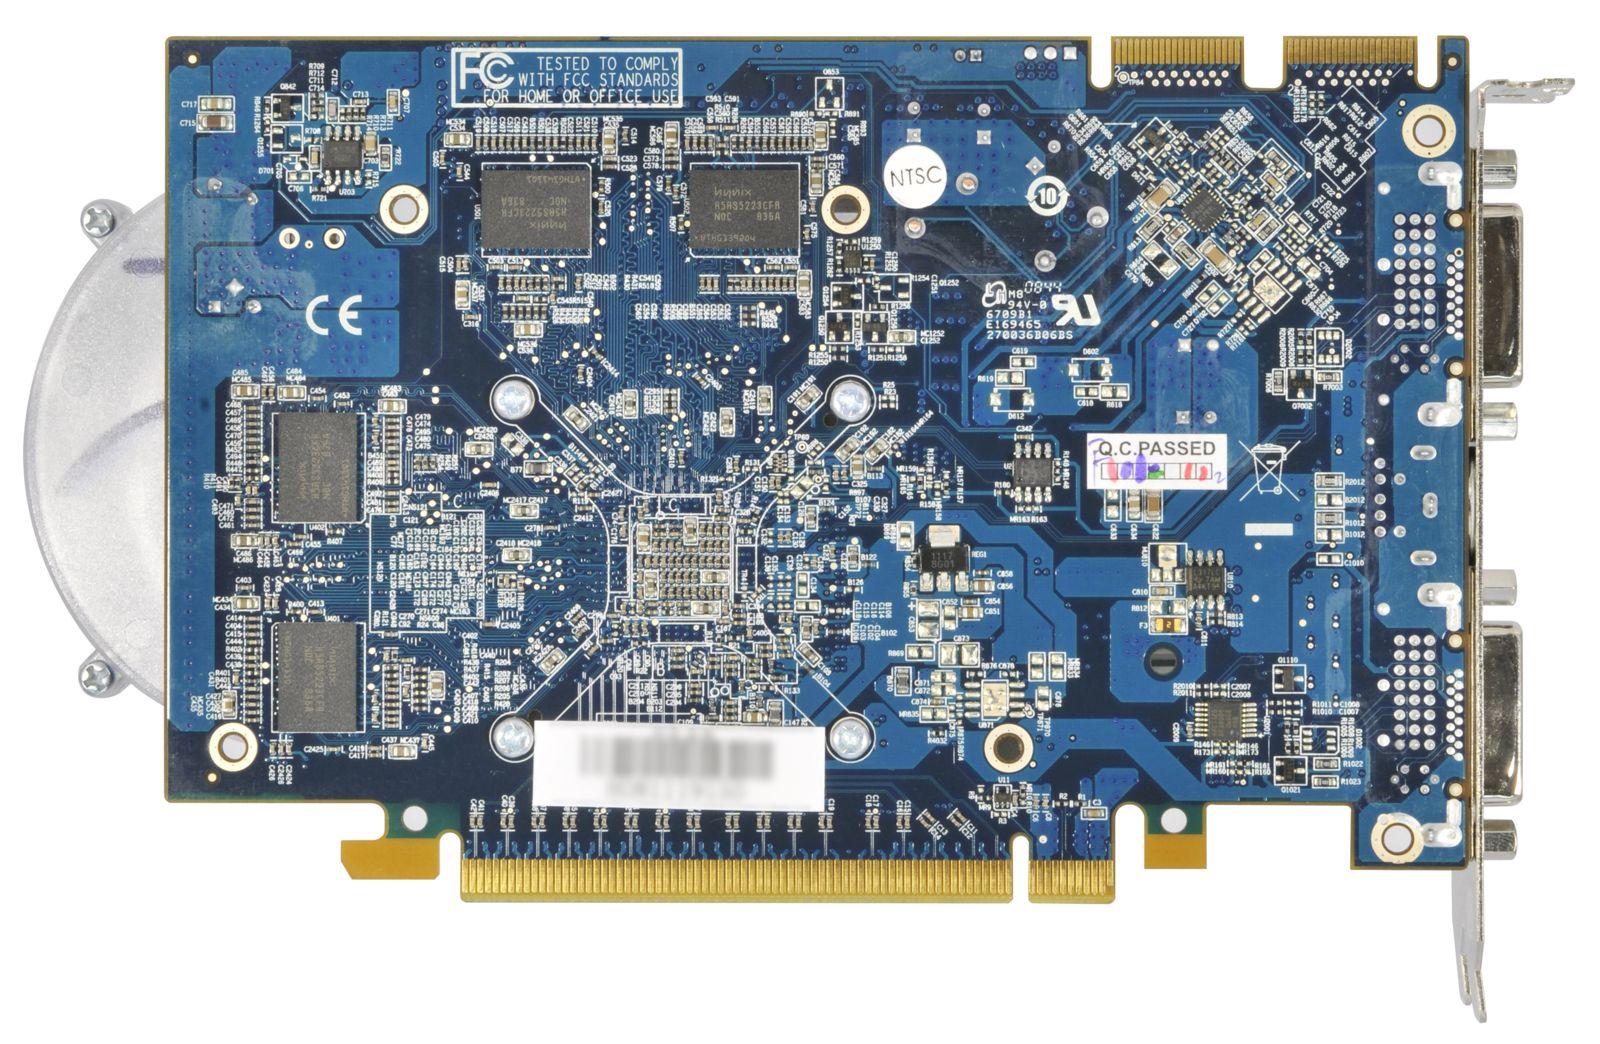 His Hd 4670 Iceq Turbo 512mb 128bit Ddr3 Pcie Legacy Products H 264 Dvr Circuit Diagram Desktop Grafik Graphic Cards